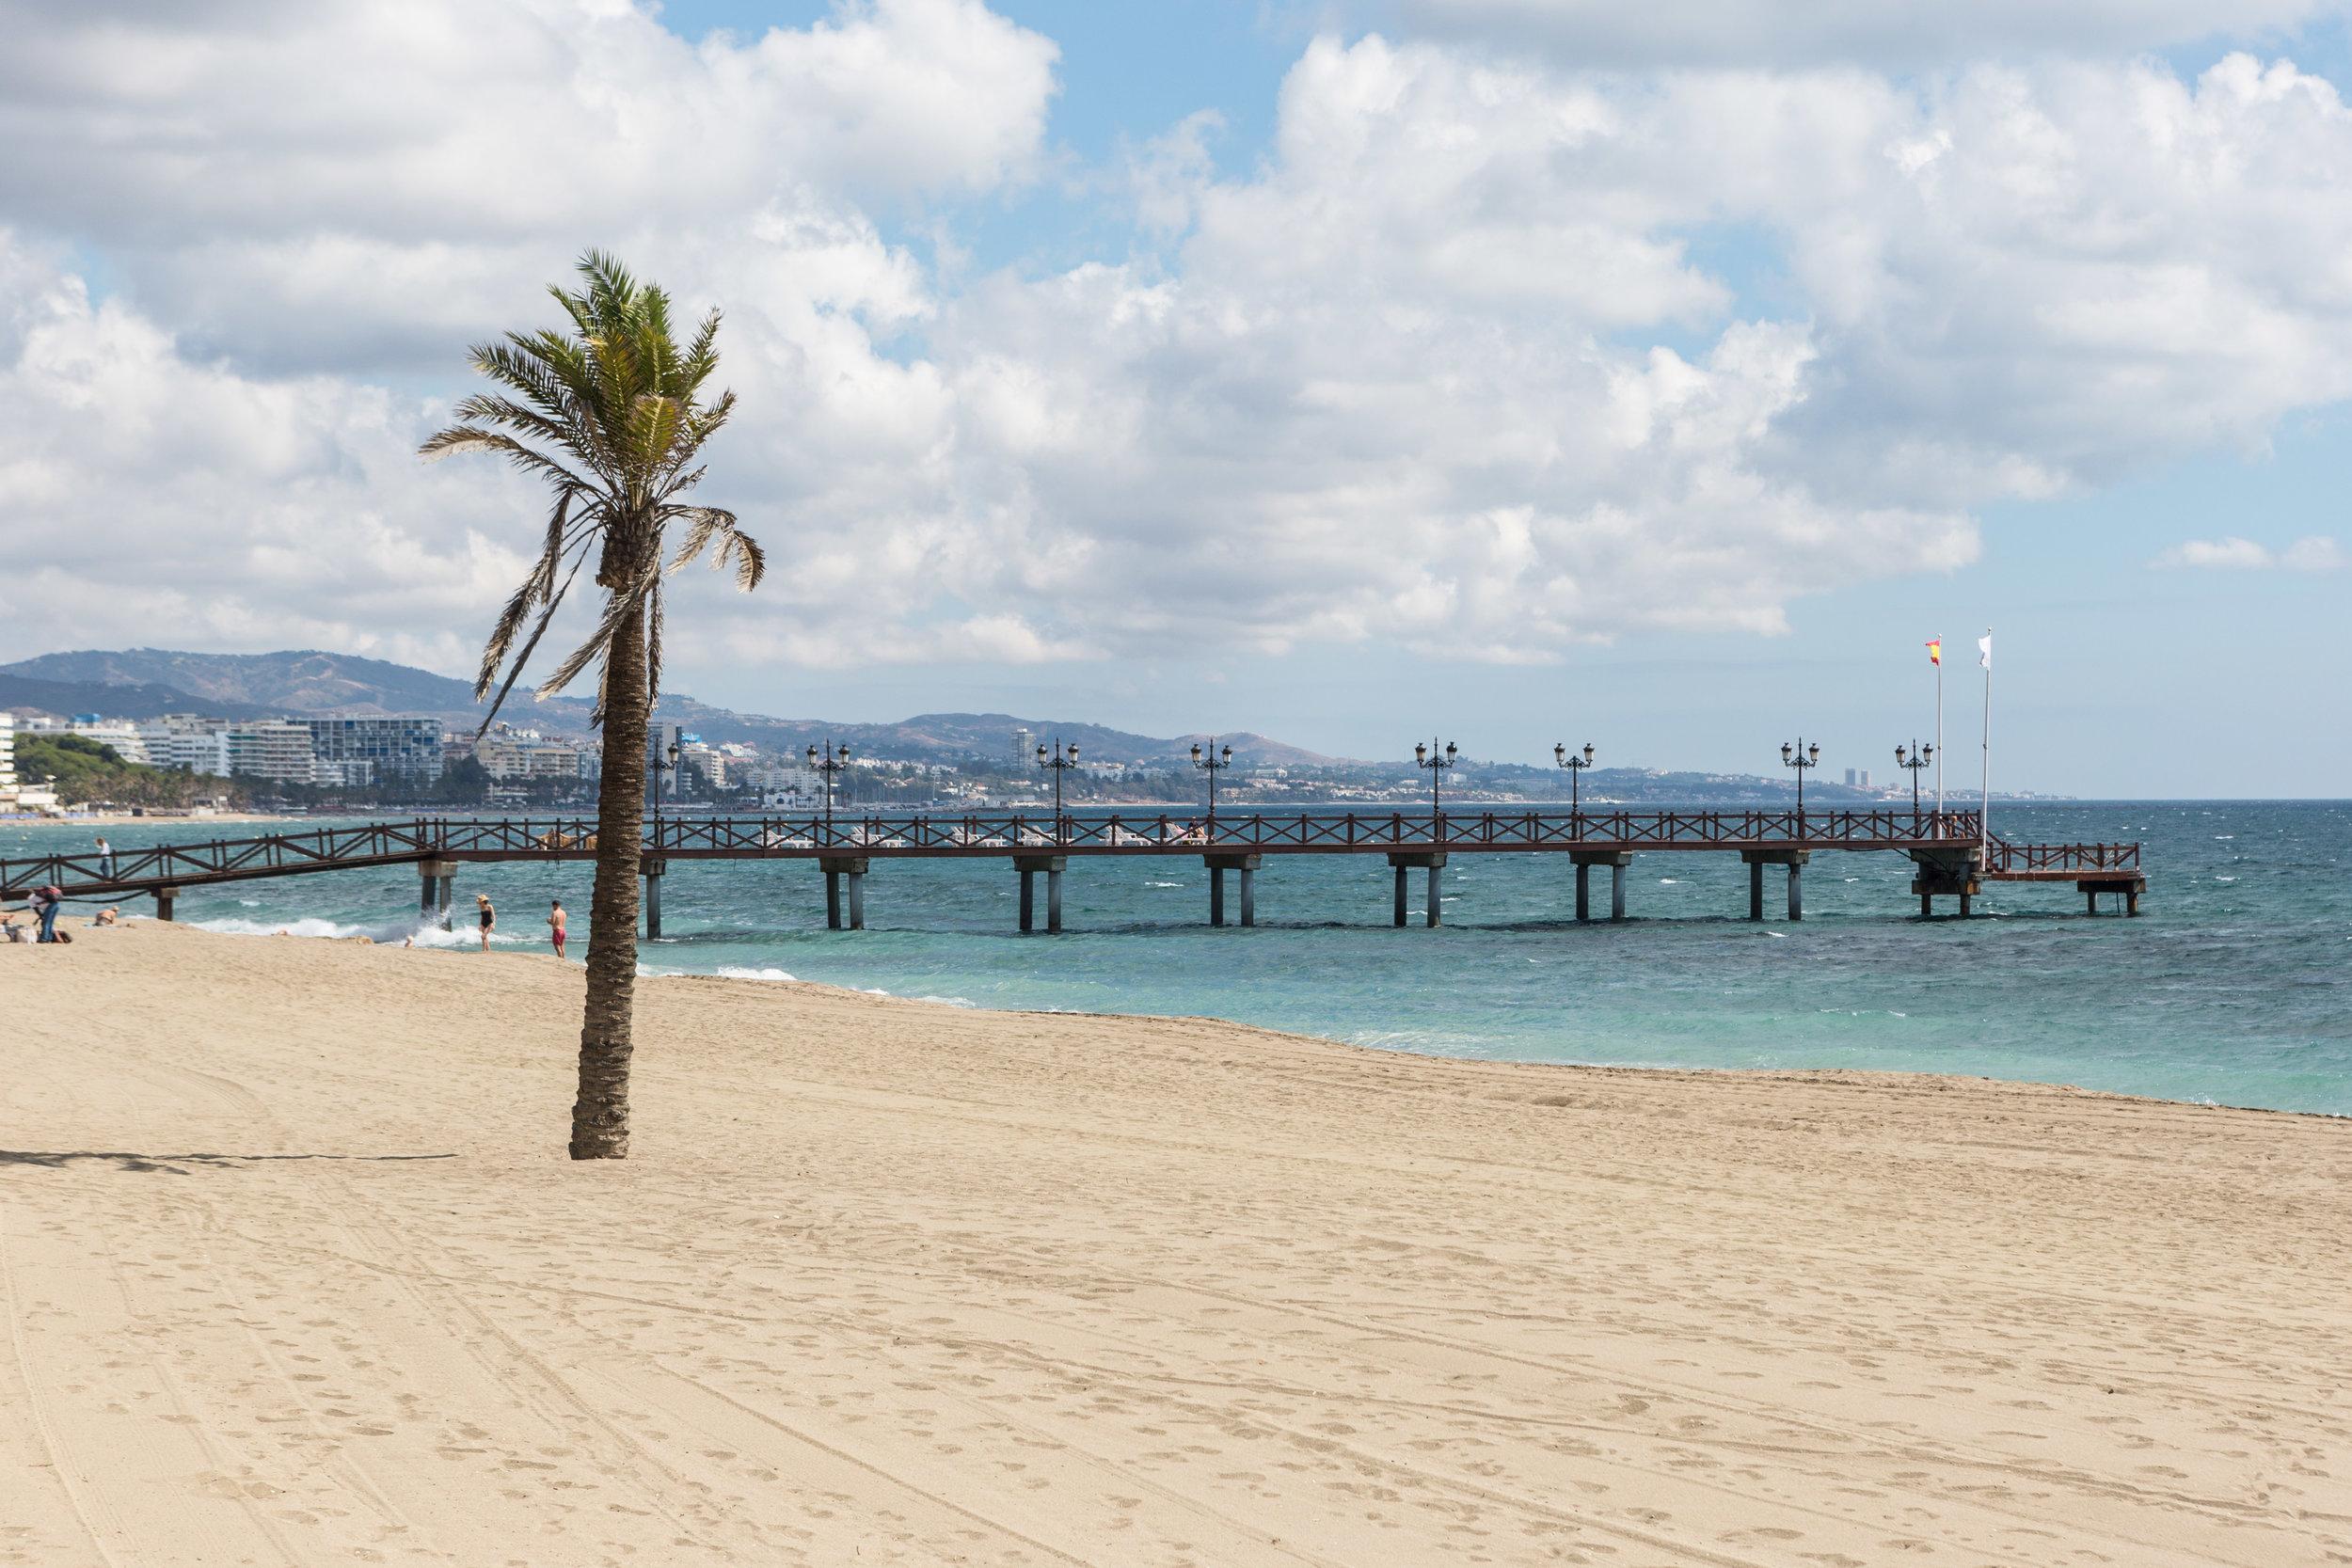 Marbella beach